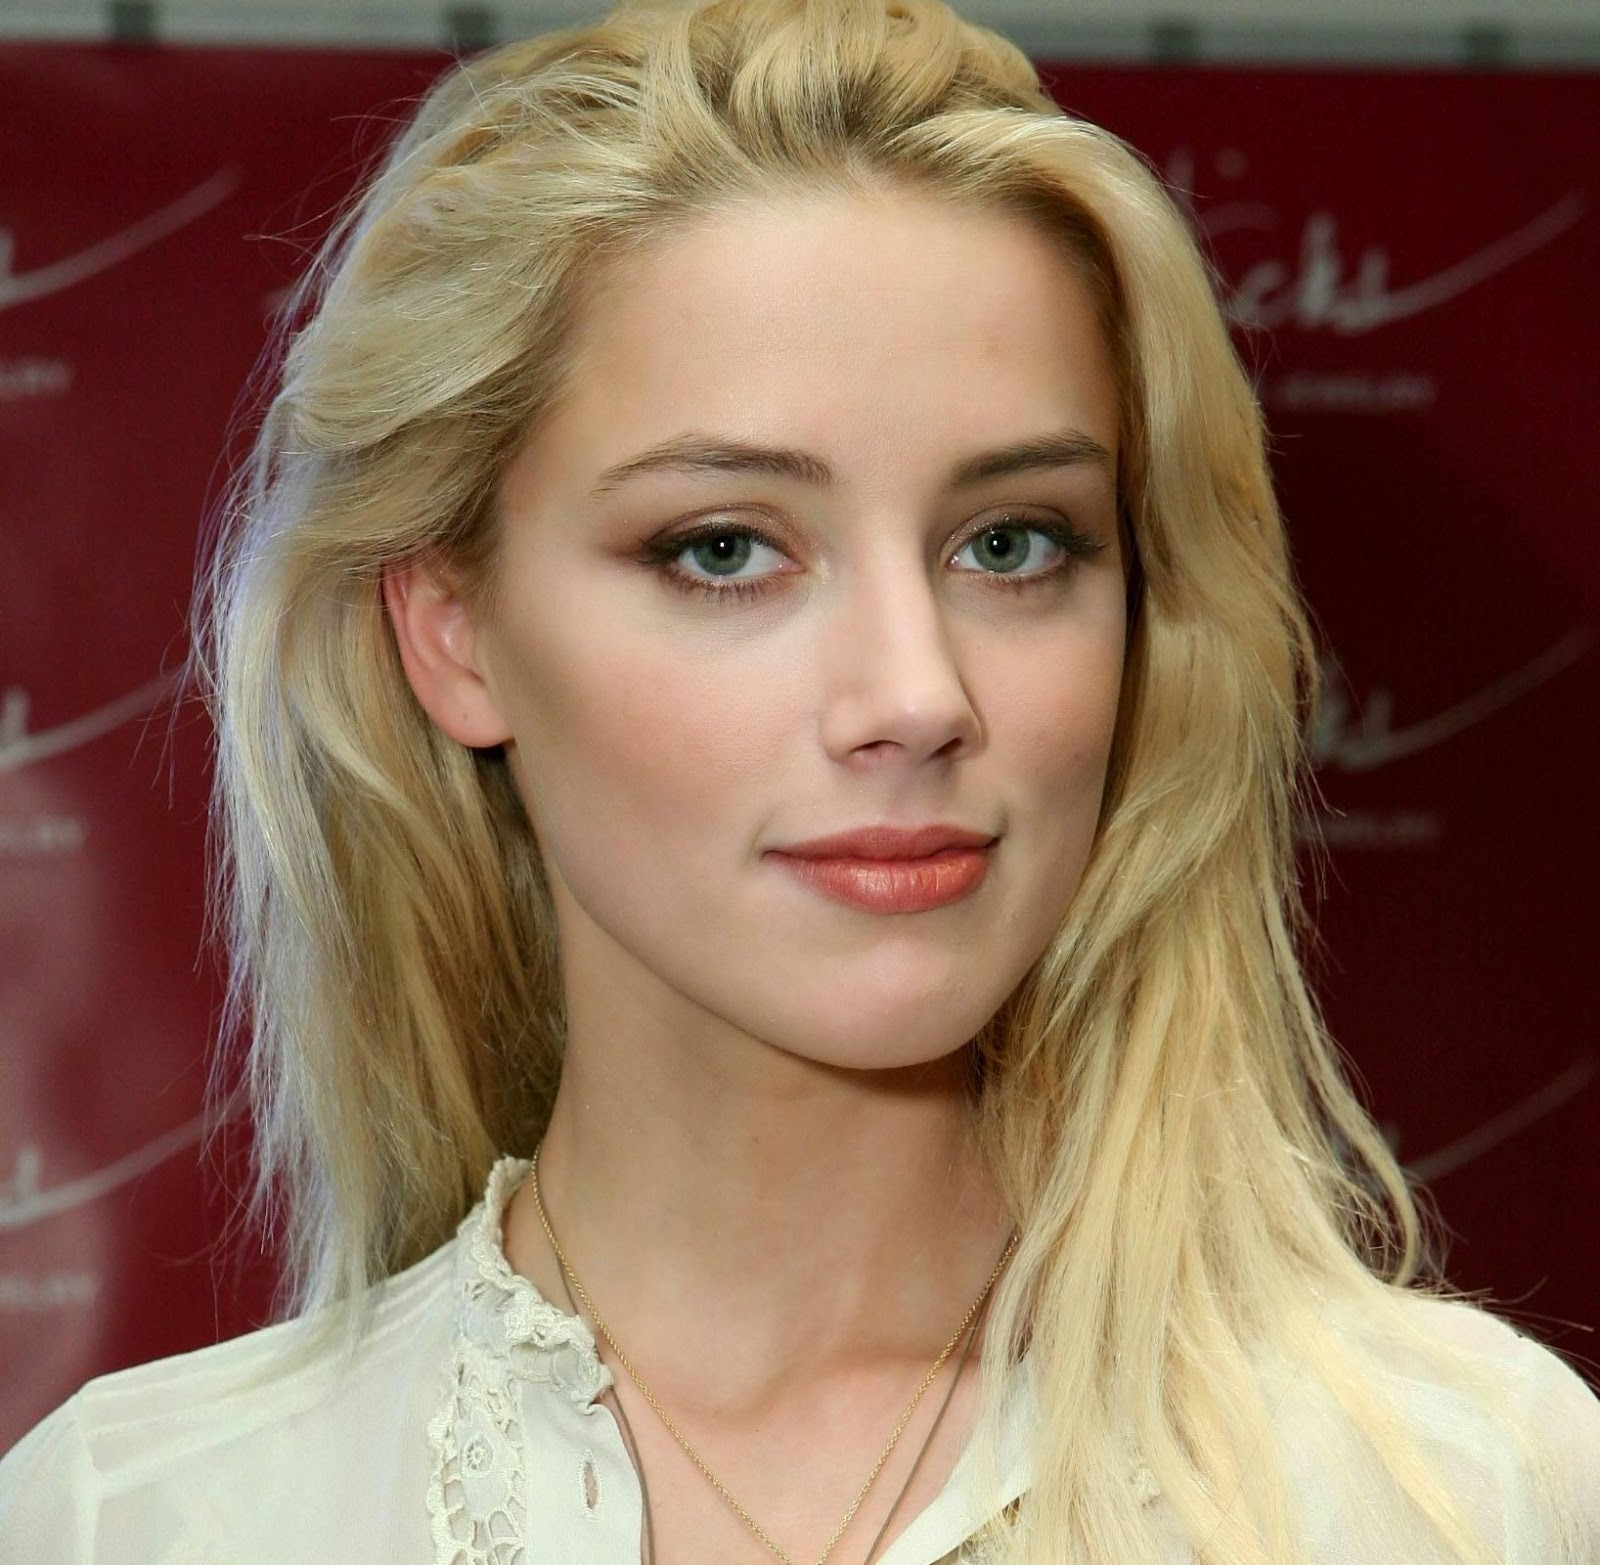 Amber Heard: Free Download HD Wallpapers: Amber Heard HD Wallpapers